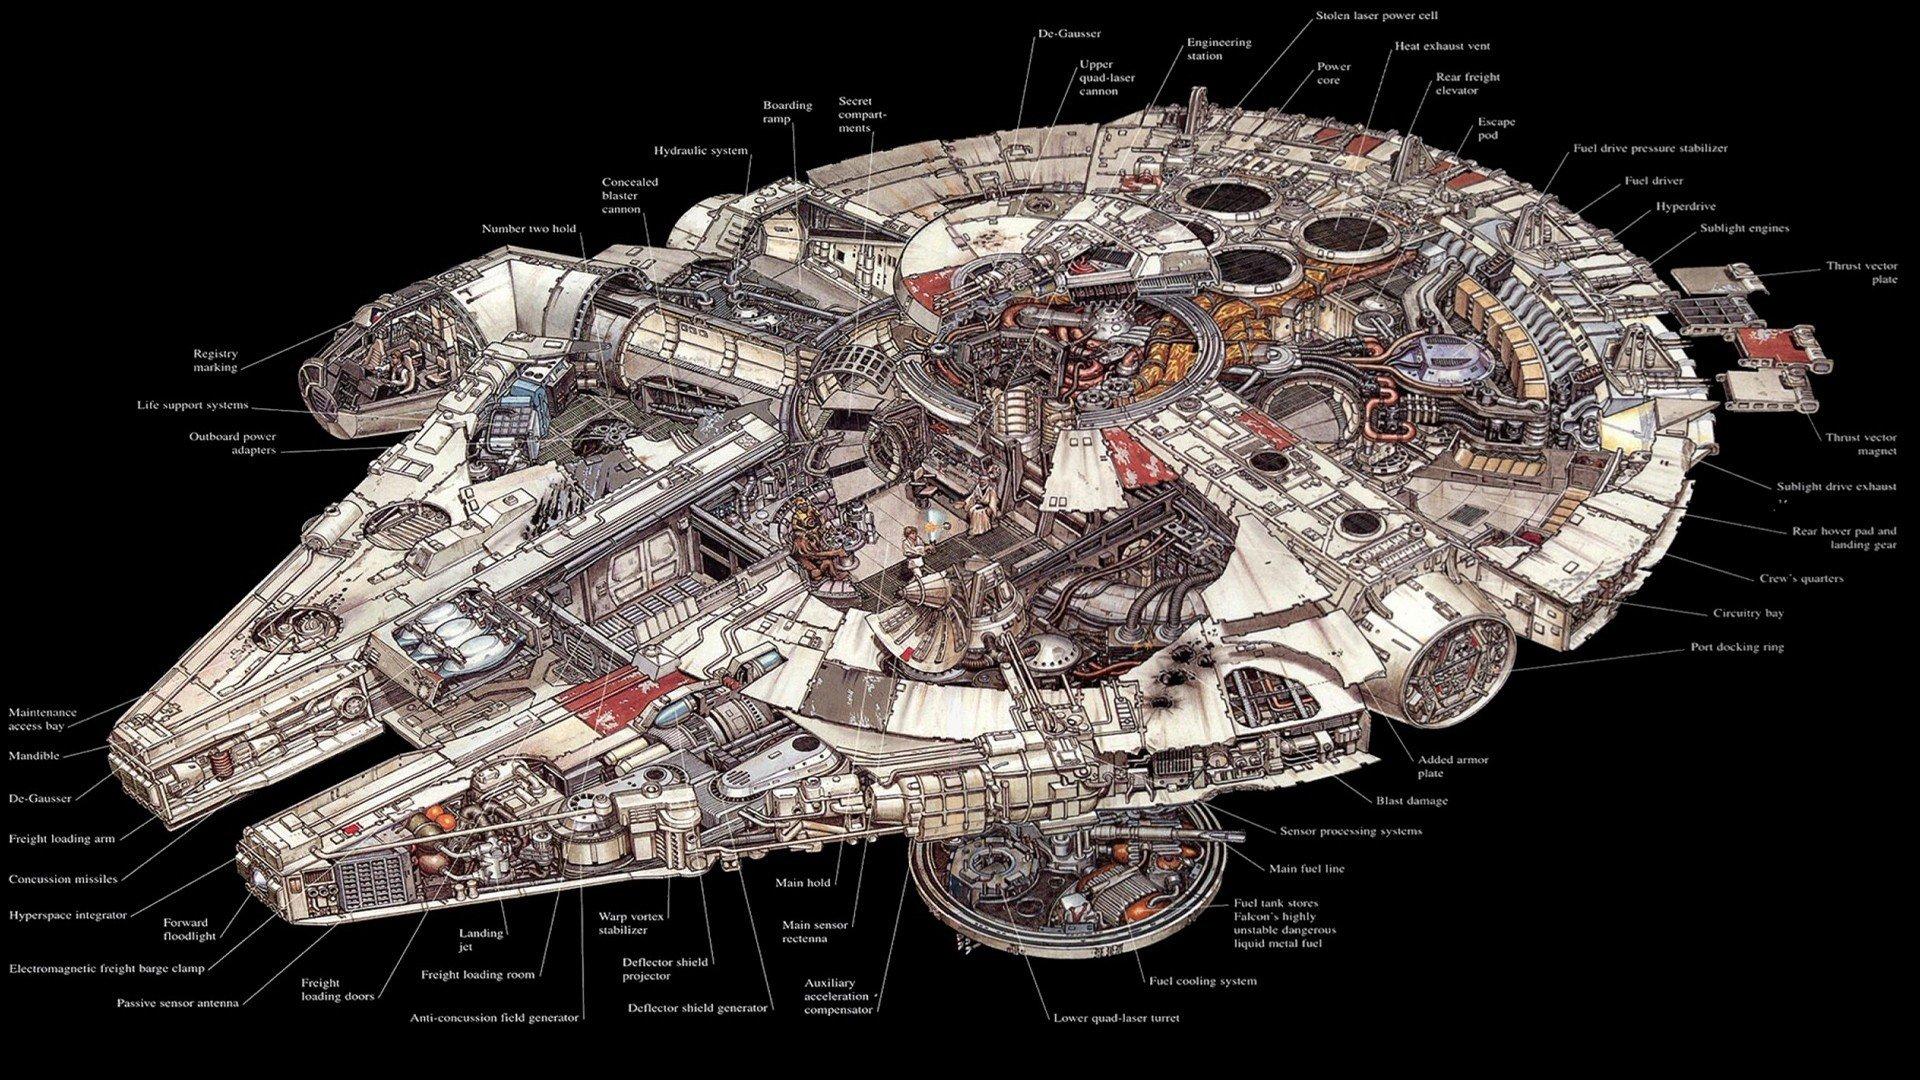 Star Wars Millennium Falcon schematic science fiction wallpaper 1920x1080